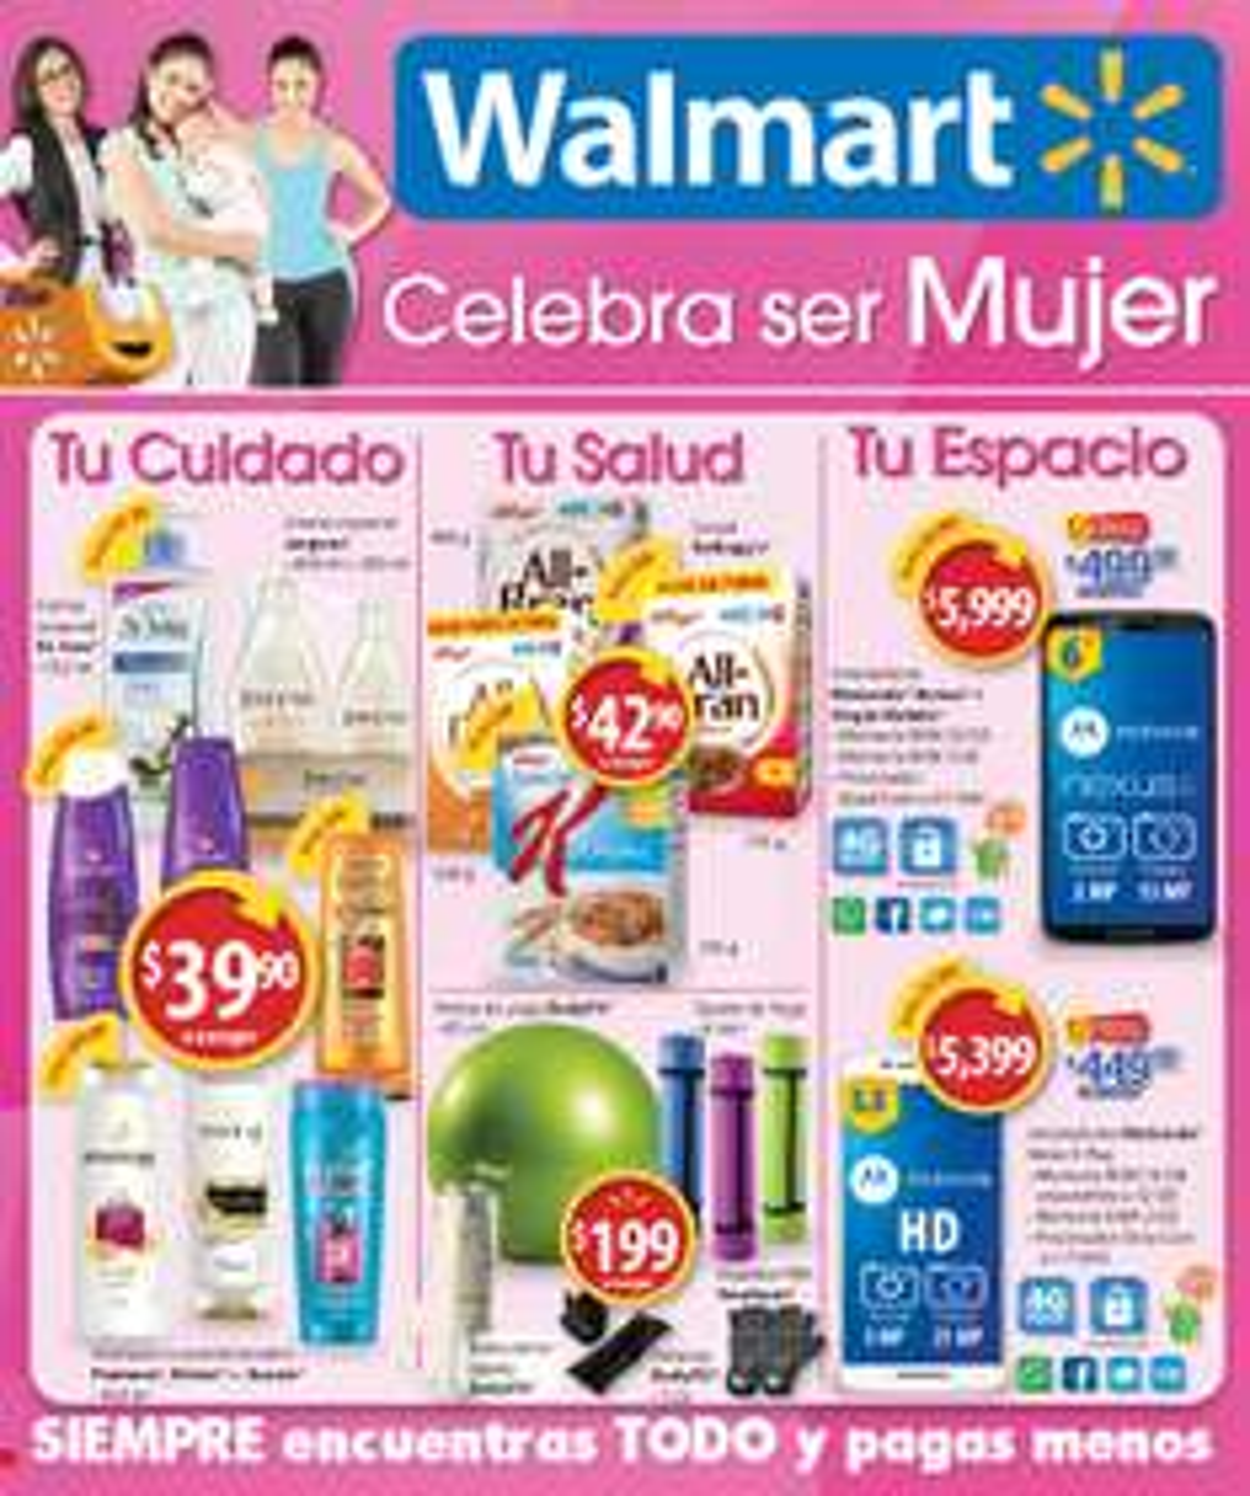 Walmart: Folleto del 11 al 24 de mayo celebra a la mujer